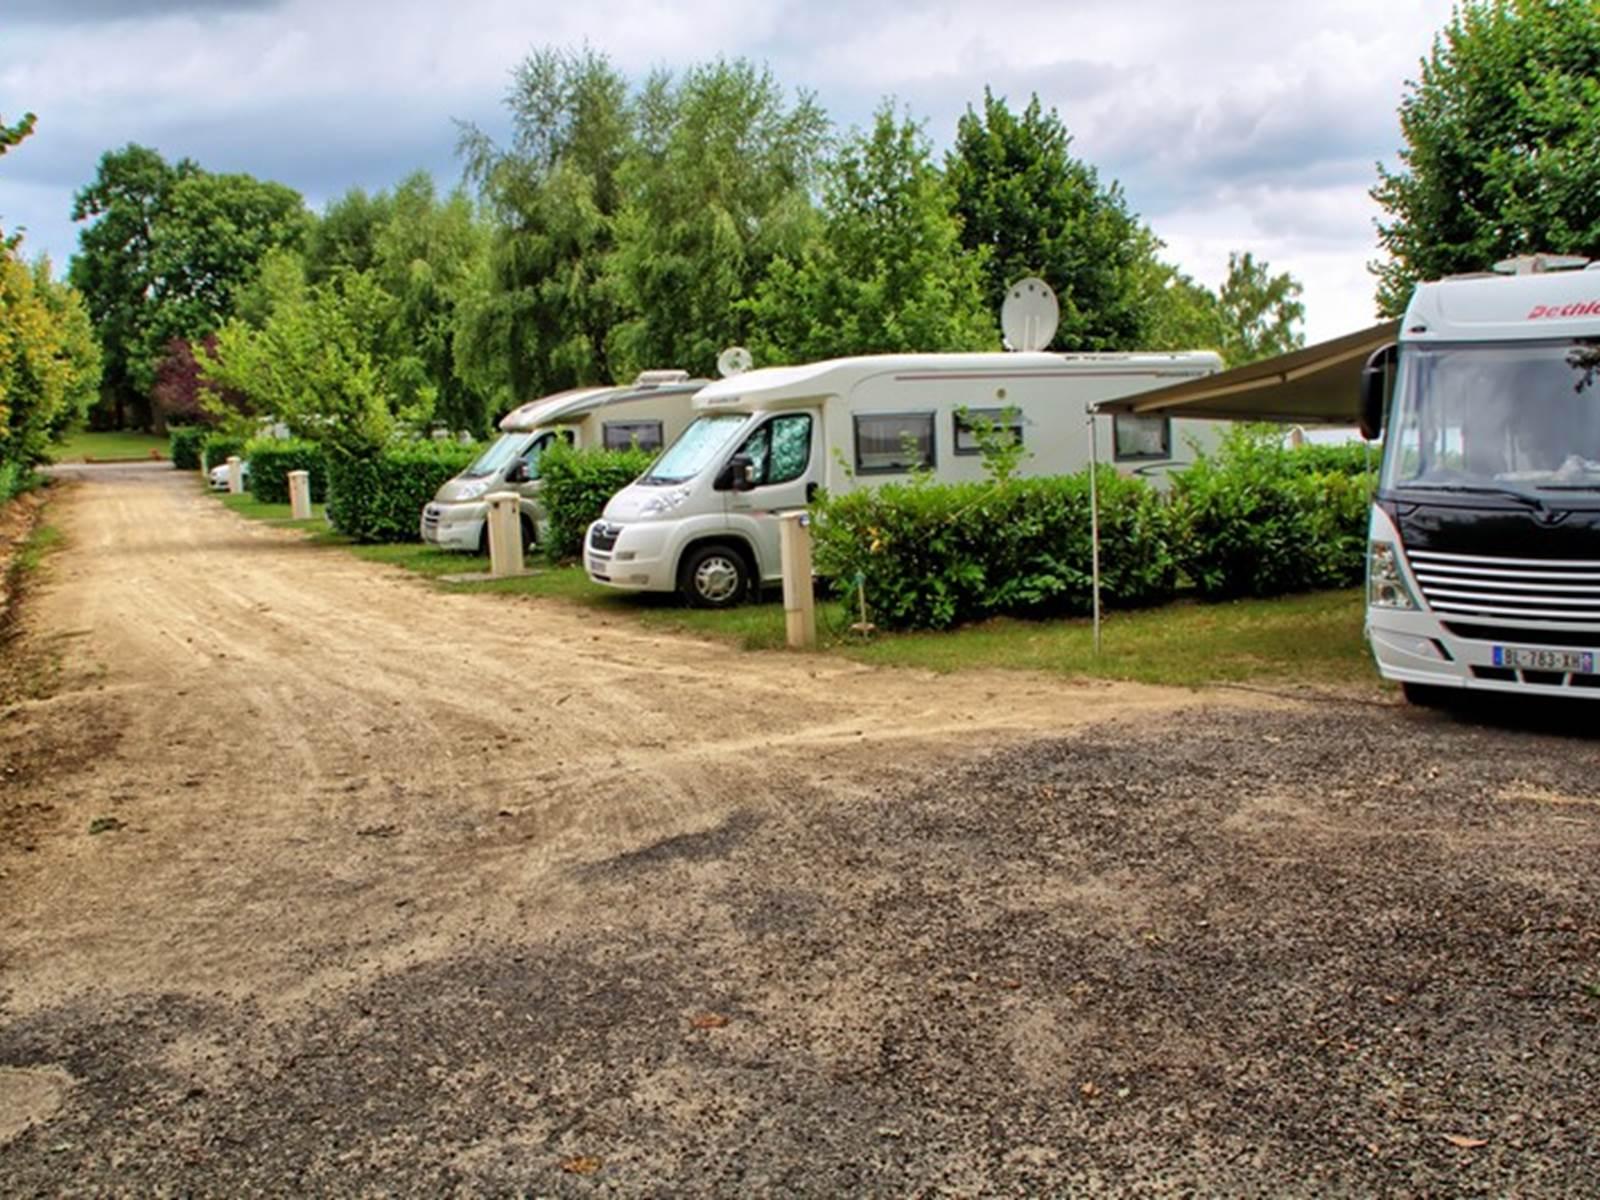 camping de la lande nexon limousin (30)